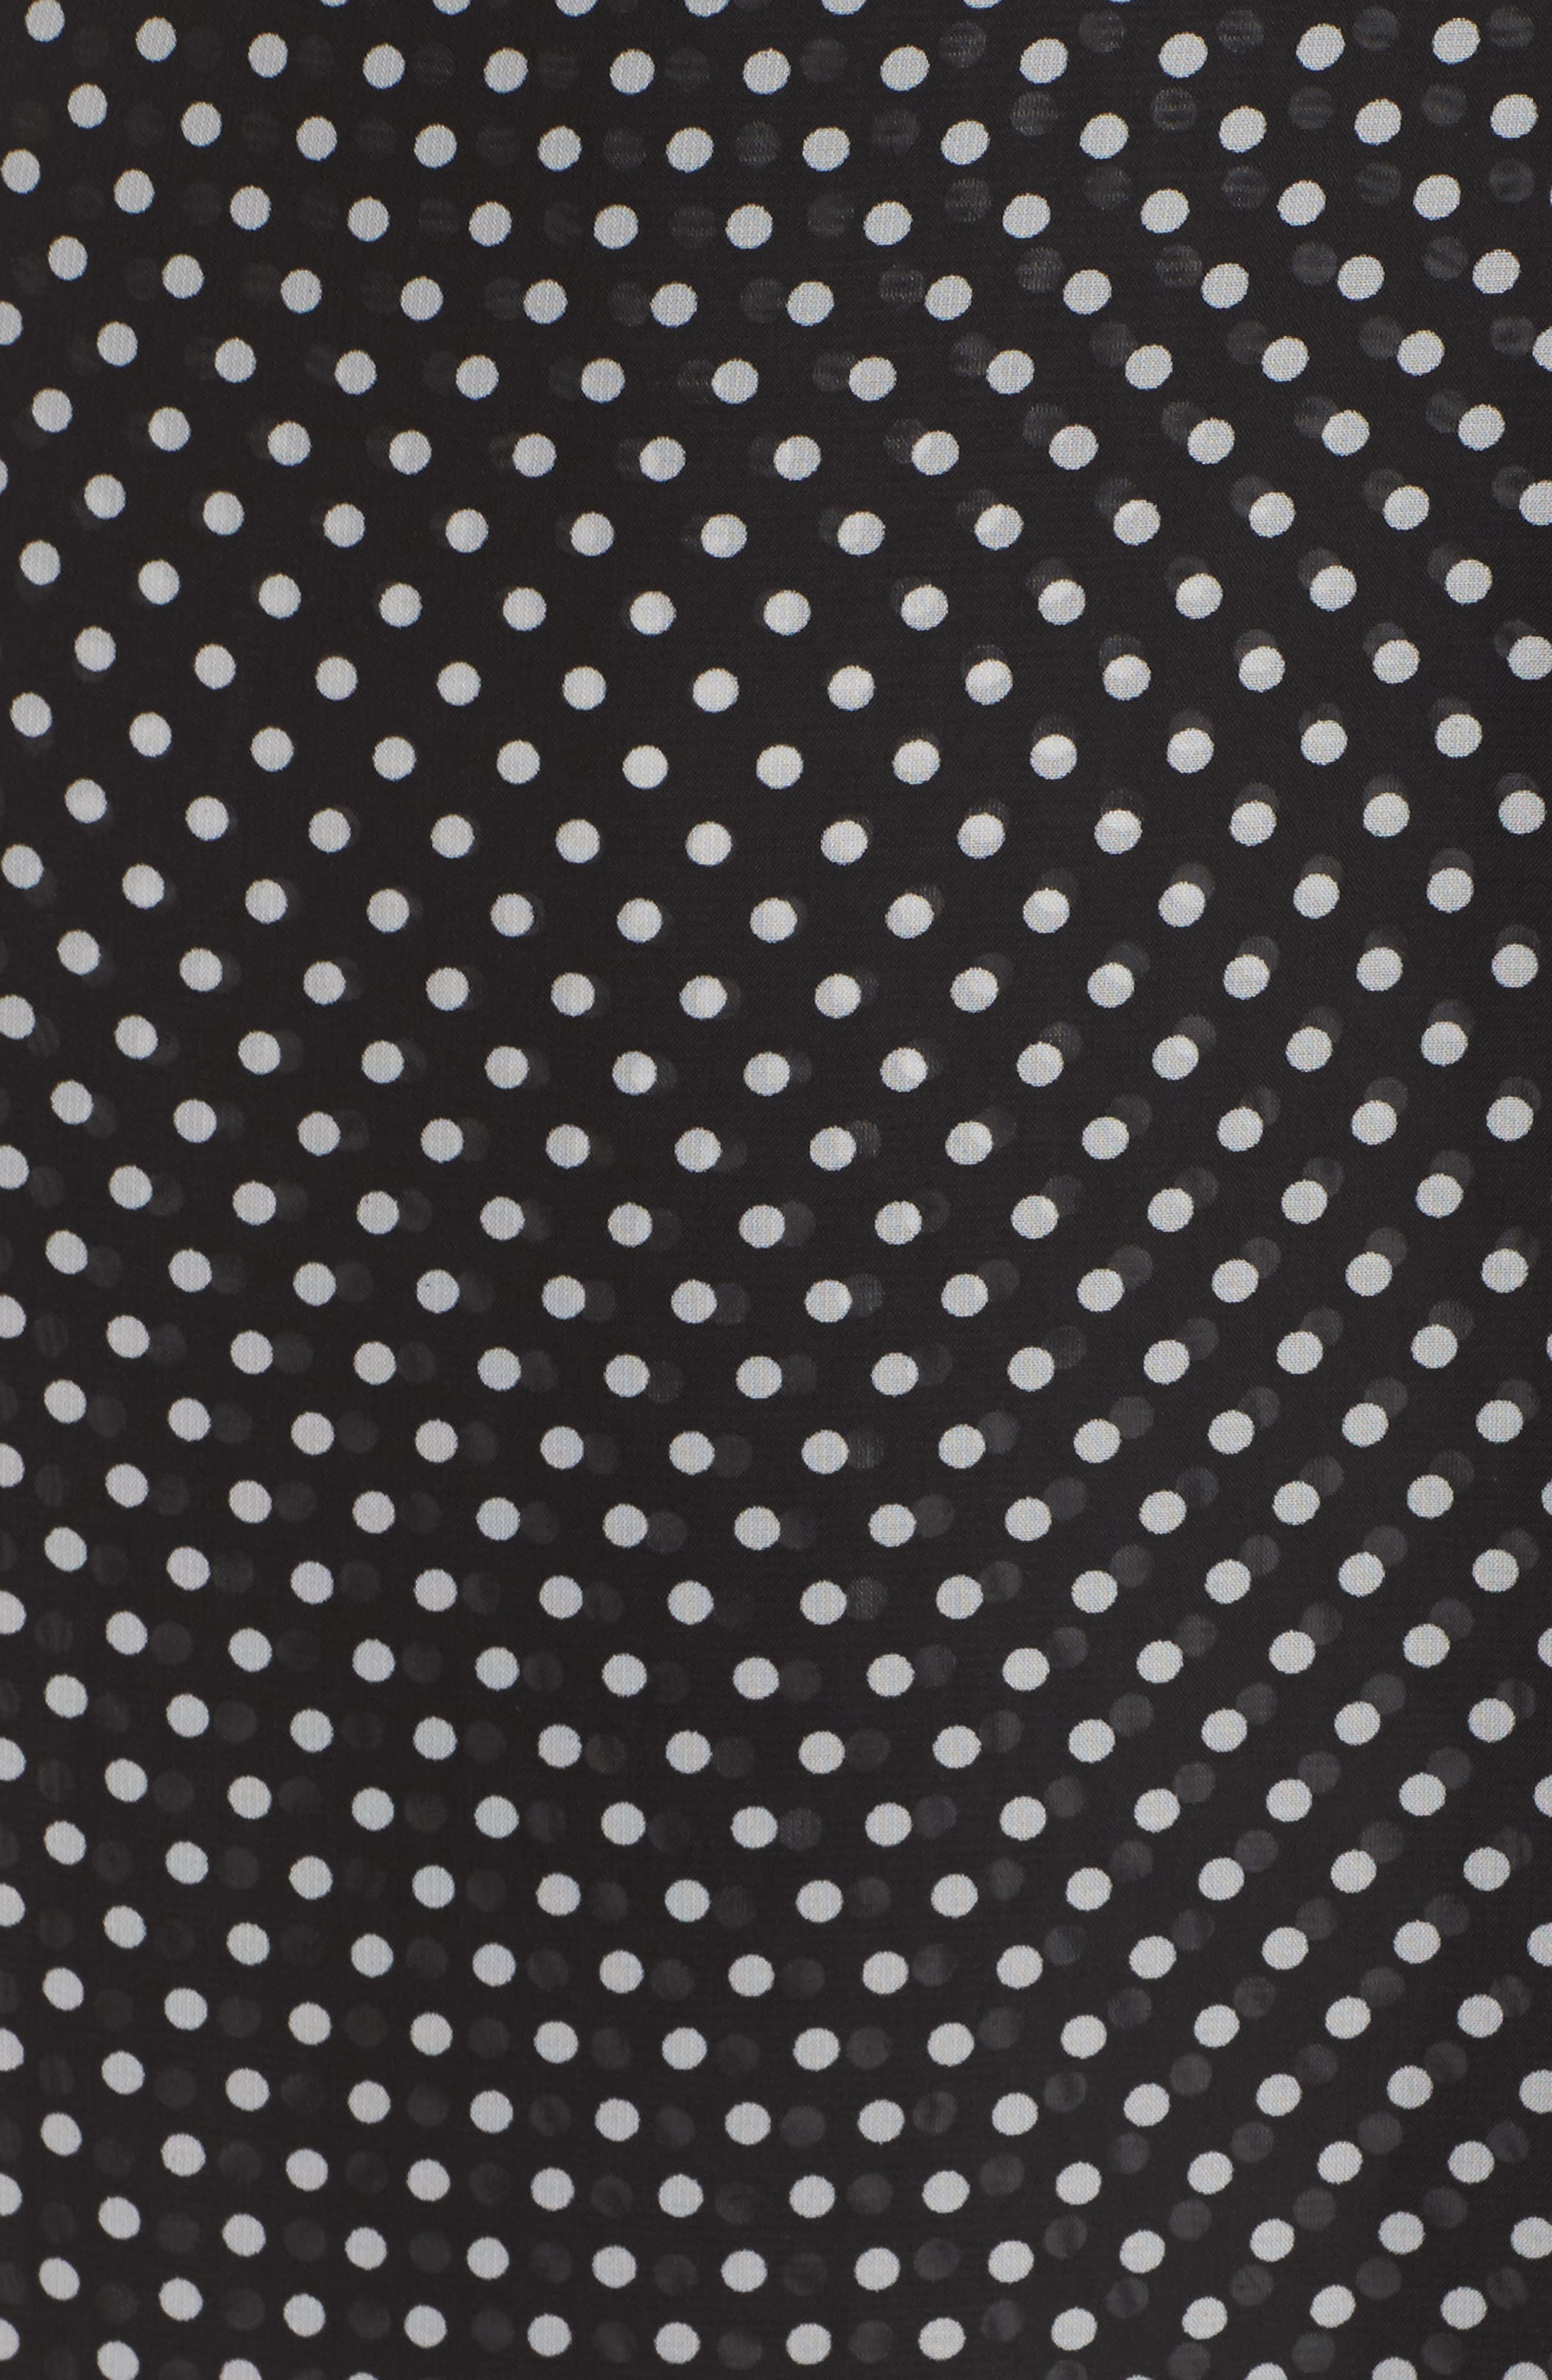 Polka Dot Faux Wrap Ruffle Dress,                             Alternate thumbnail 5, color,                             Black/ Ivory